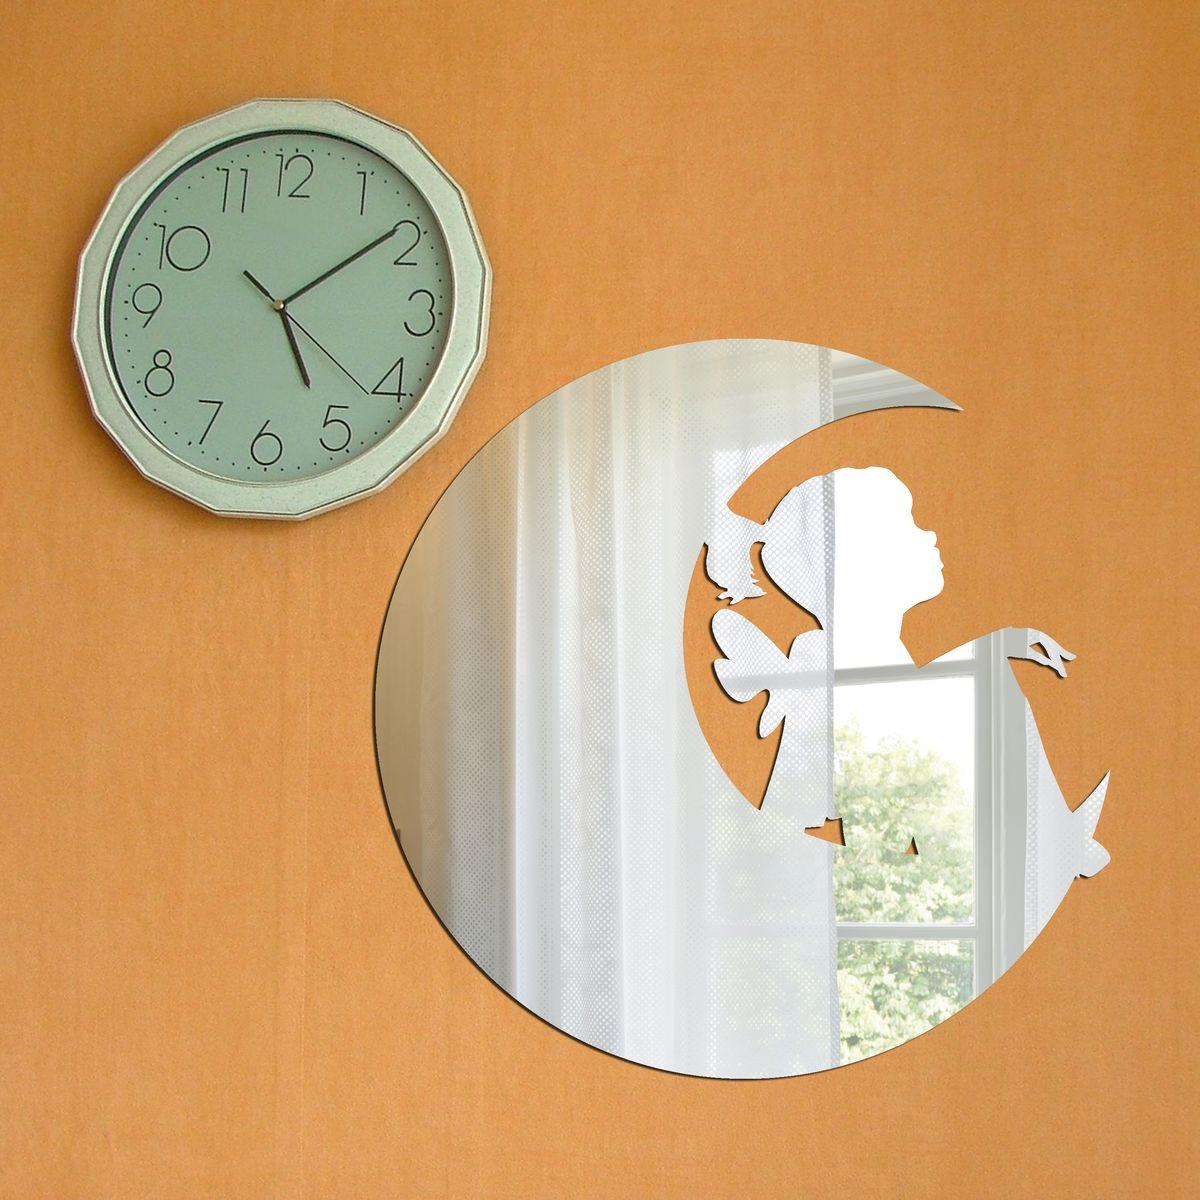 "Декоративное зеркало Paris-Paris ""На луне"", 27,5 см х 29 см ПР01338пр"